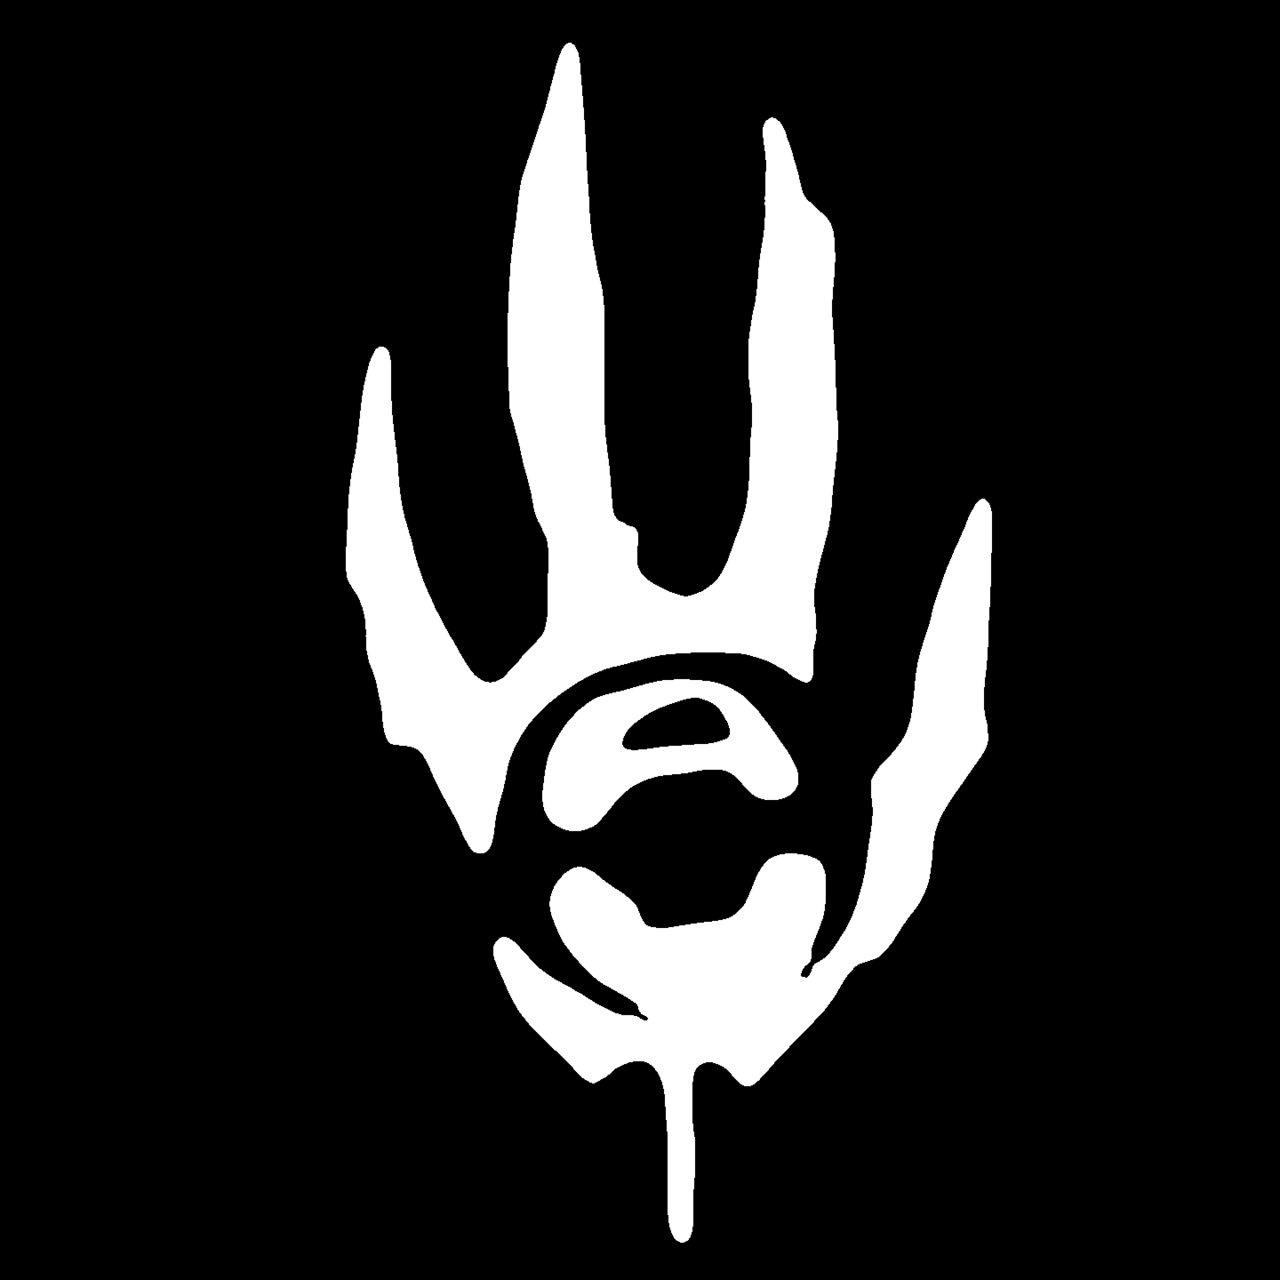 Image Symbol 4g Villains Wiki Fandom Powered By Wikia